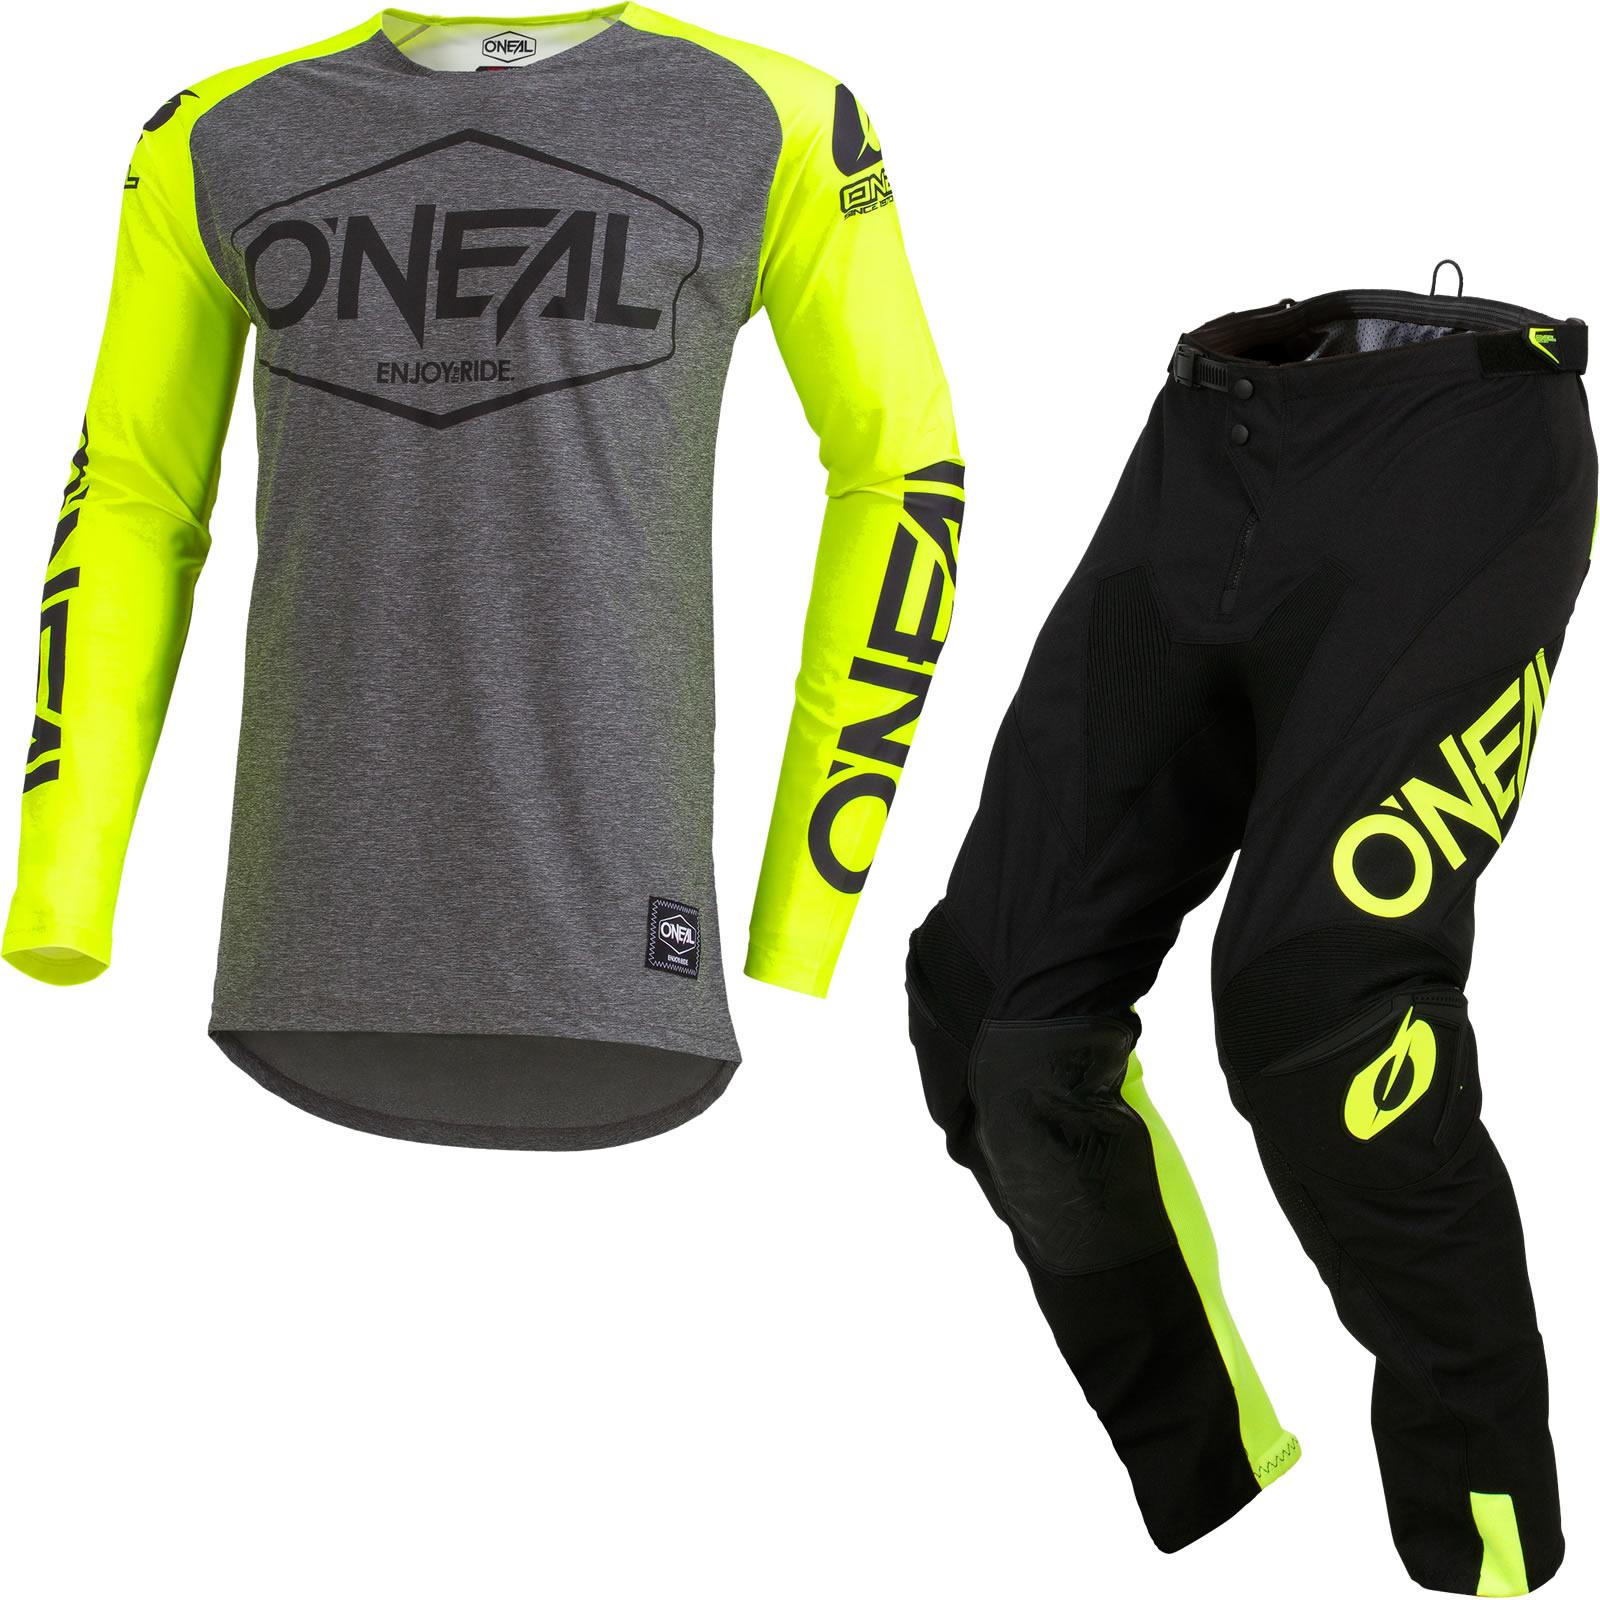 ONEAL Mayhem hexx Combo Giallo Neon ENDURO crosshose MX Jersey Guanti